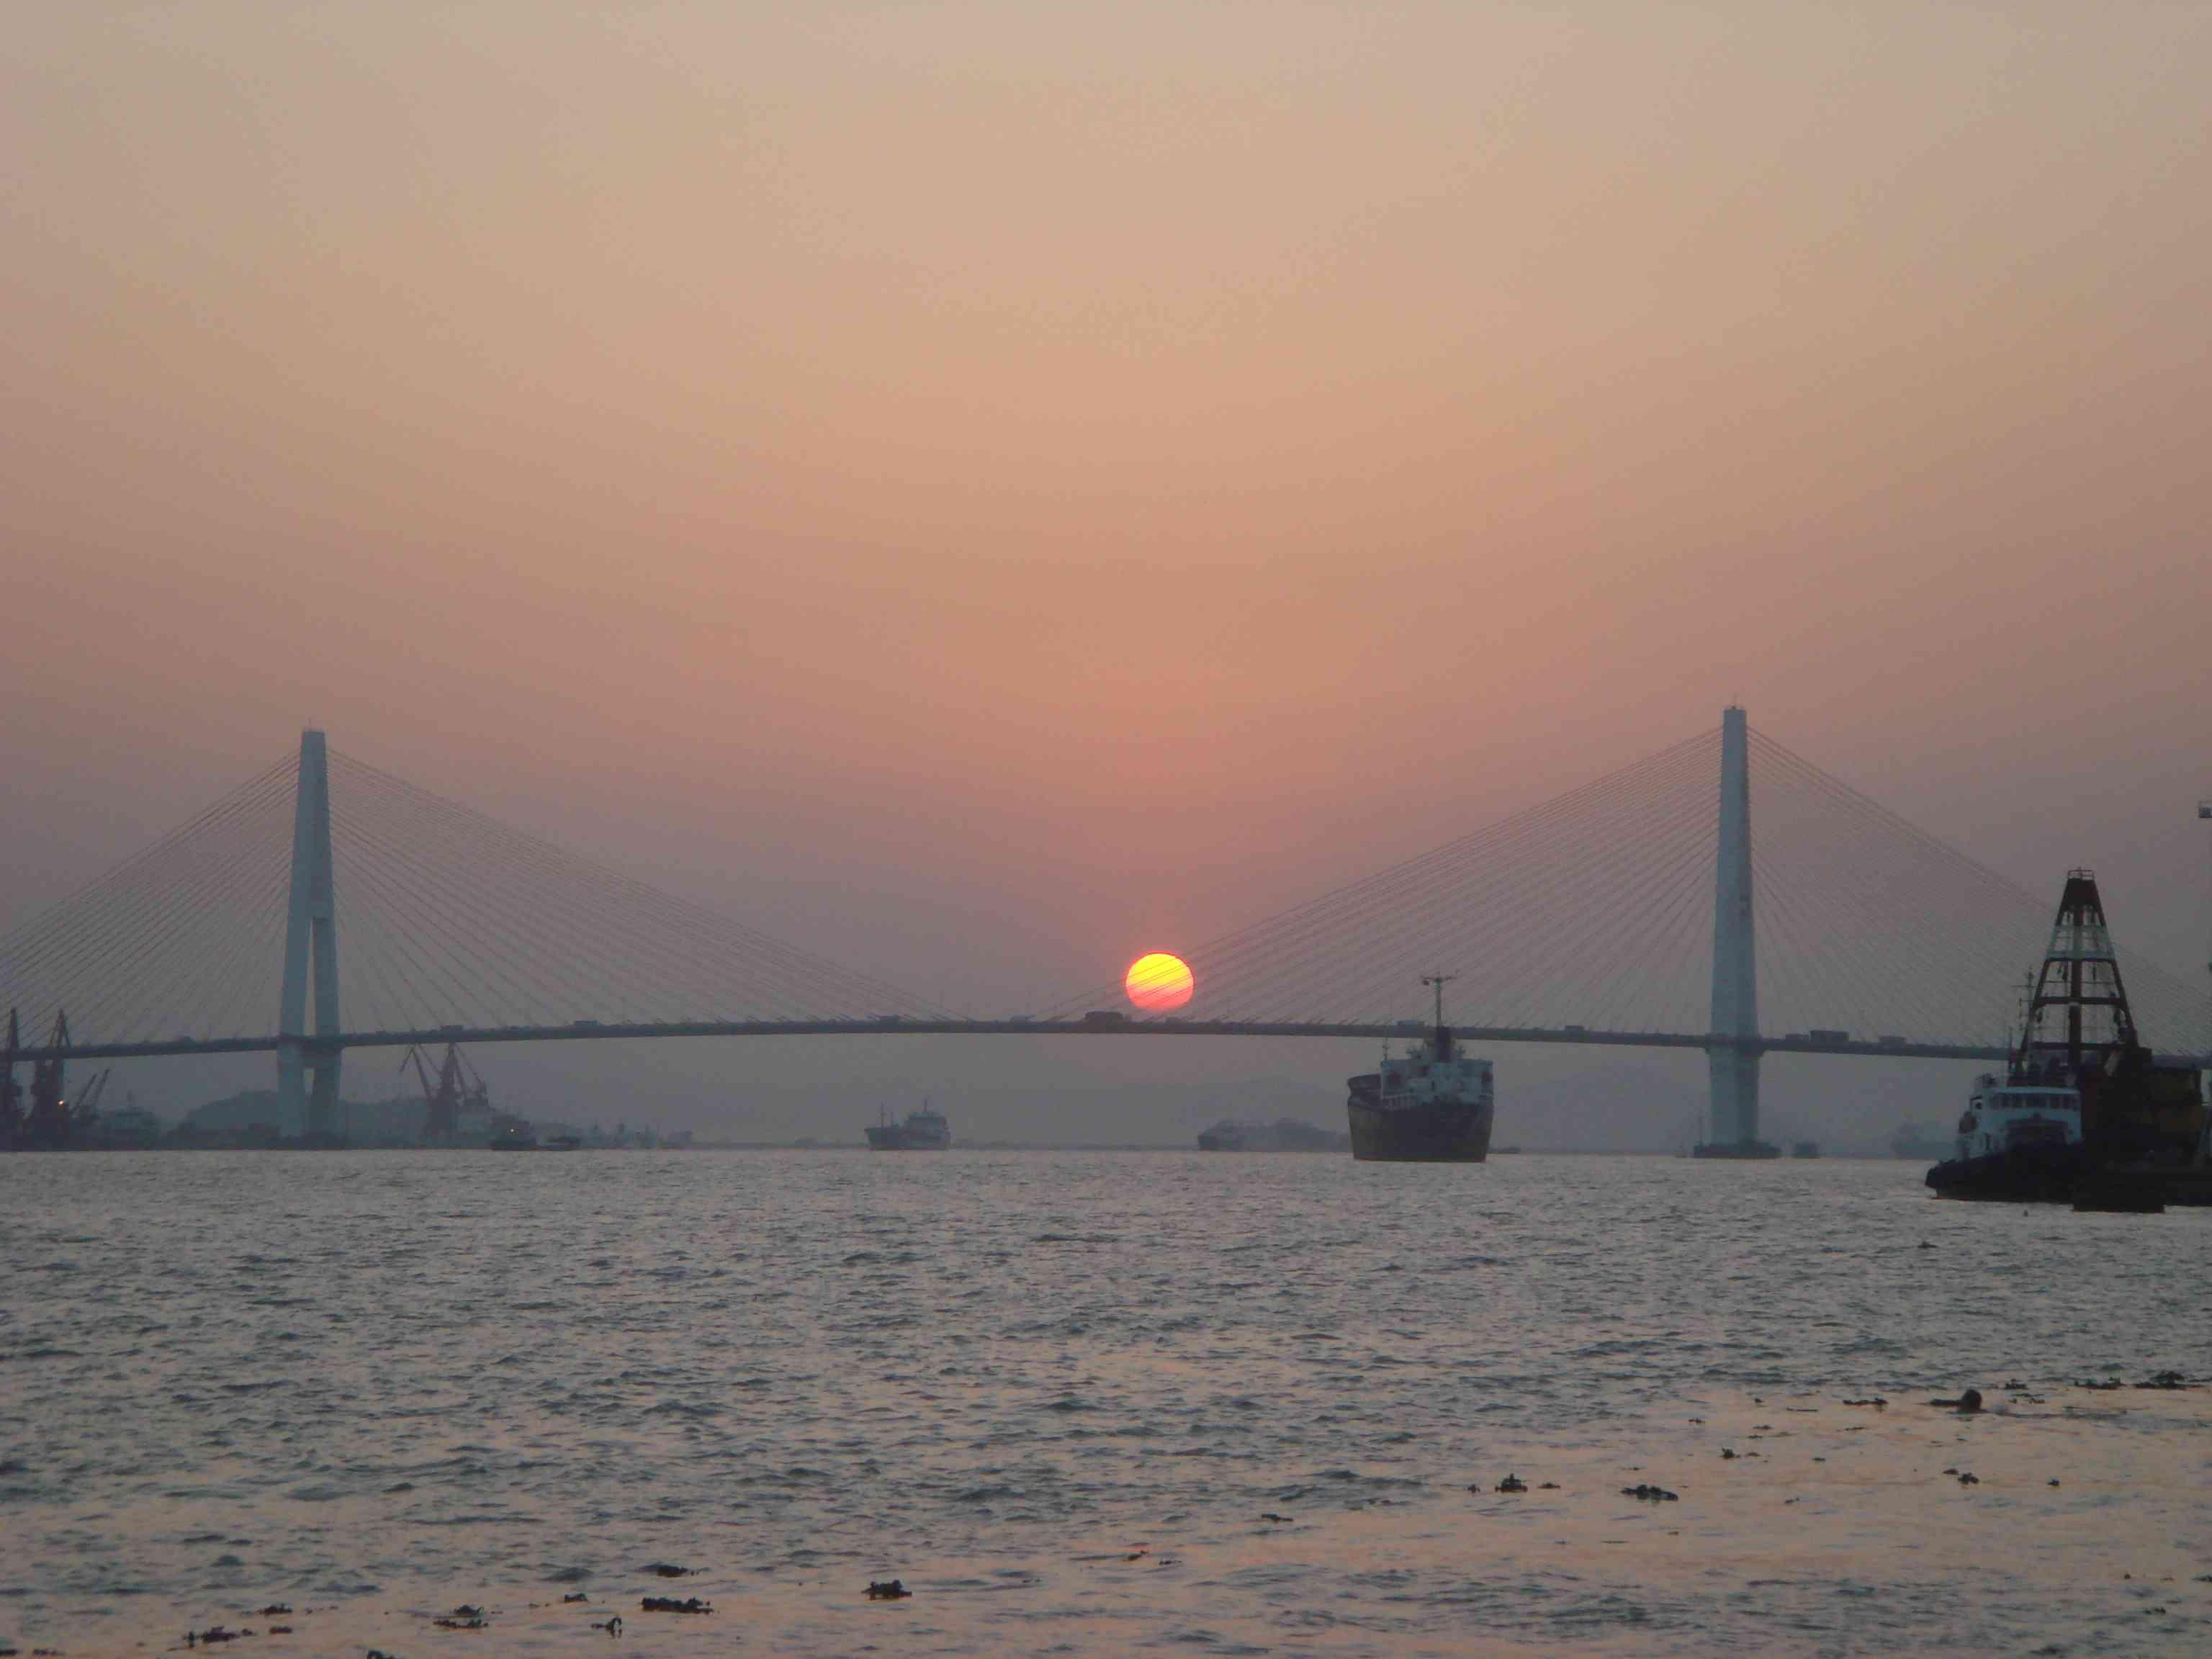 Shantou Queshi Bridge